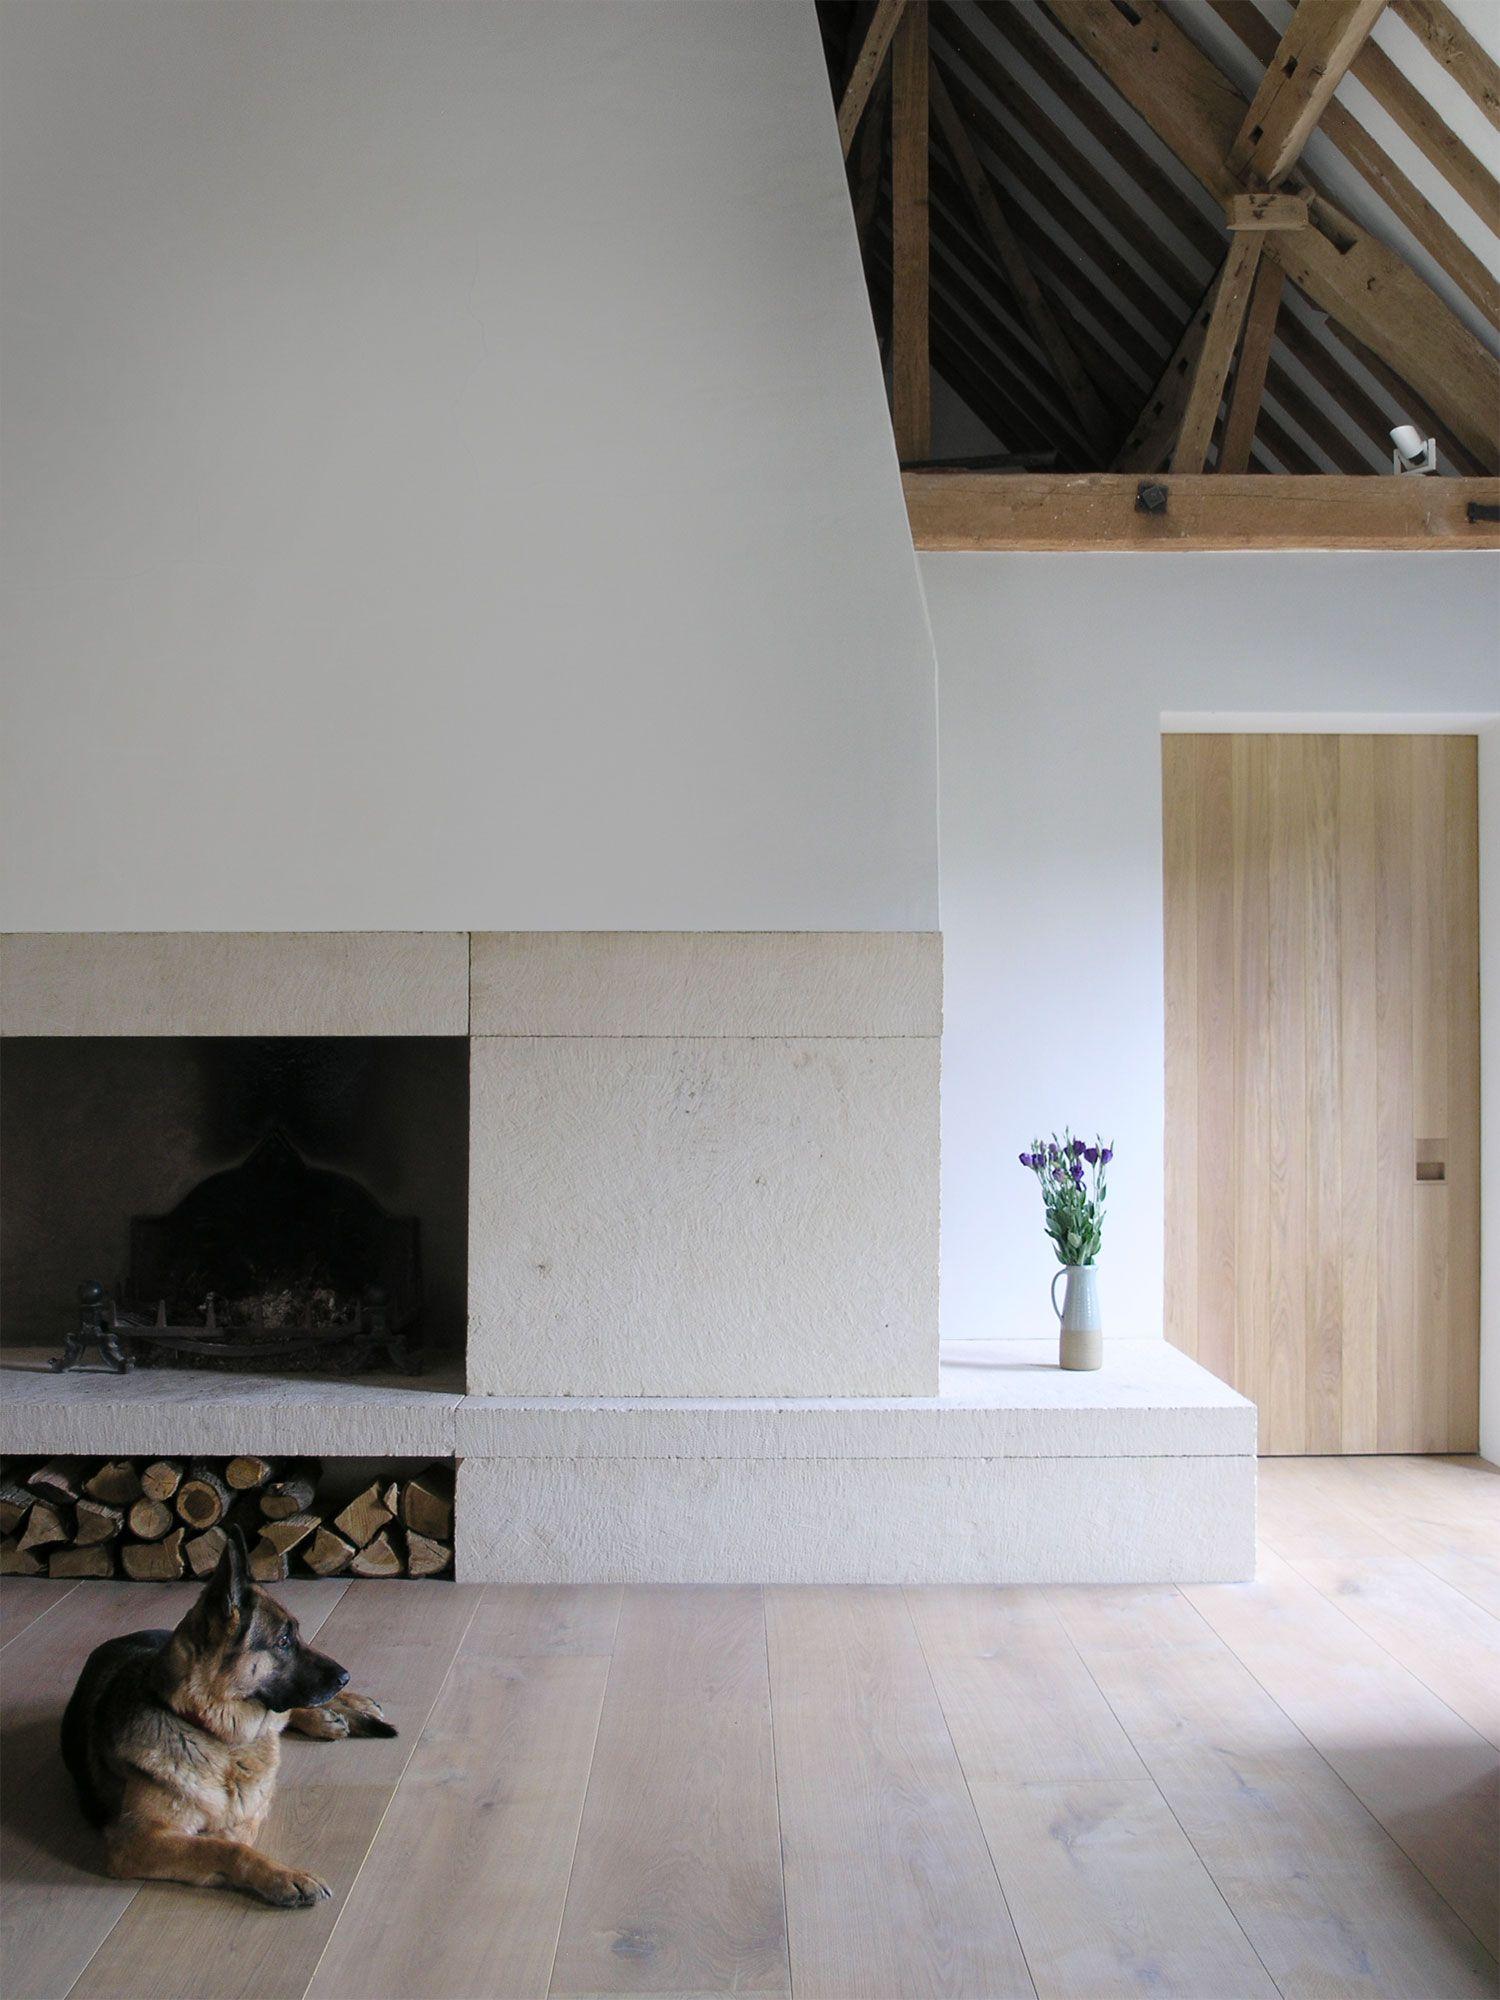 Park Corner Barn Mclaren Excell Home Fireplace Stucco